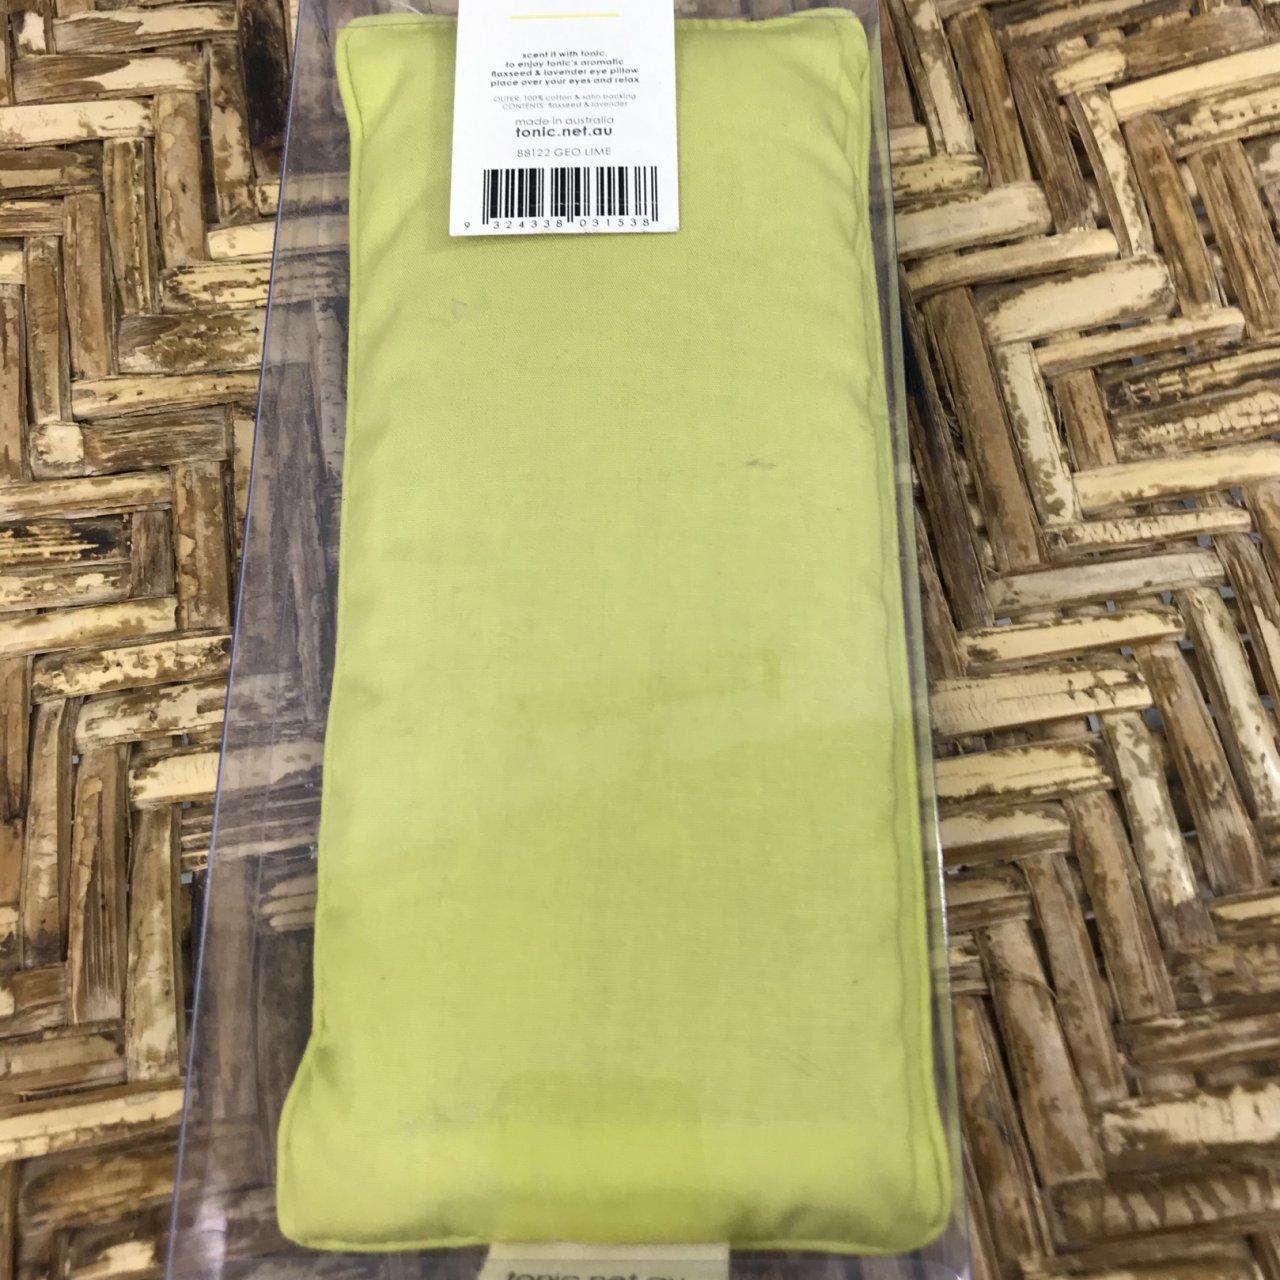 Tonic Australia eye pillow